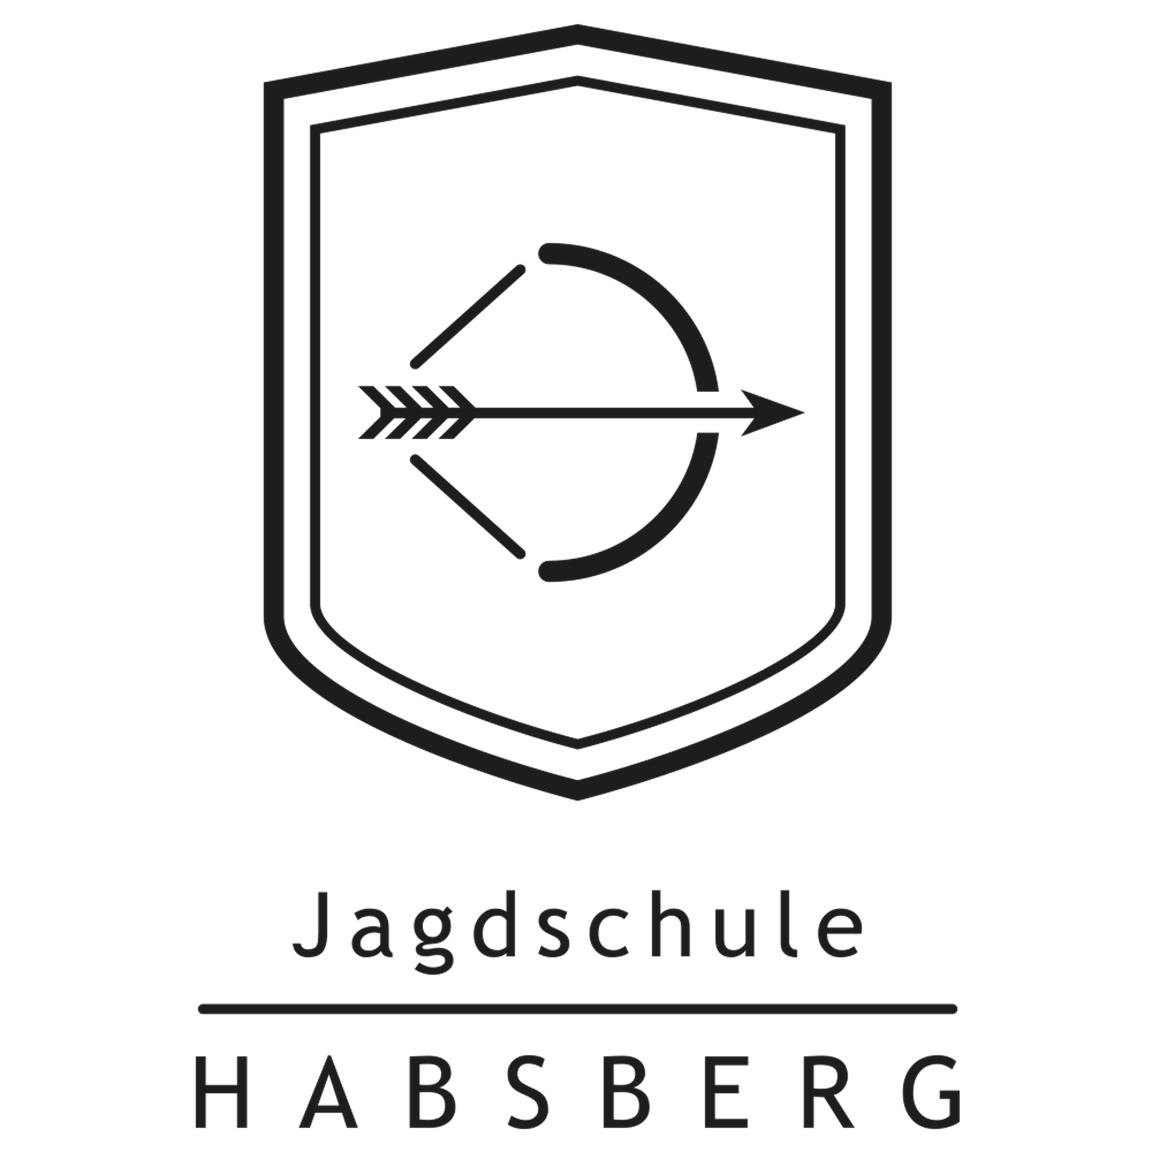 Jagdschule Habsberg